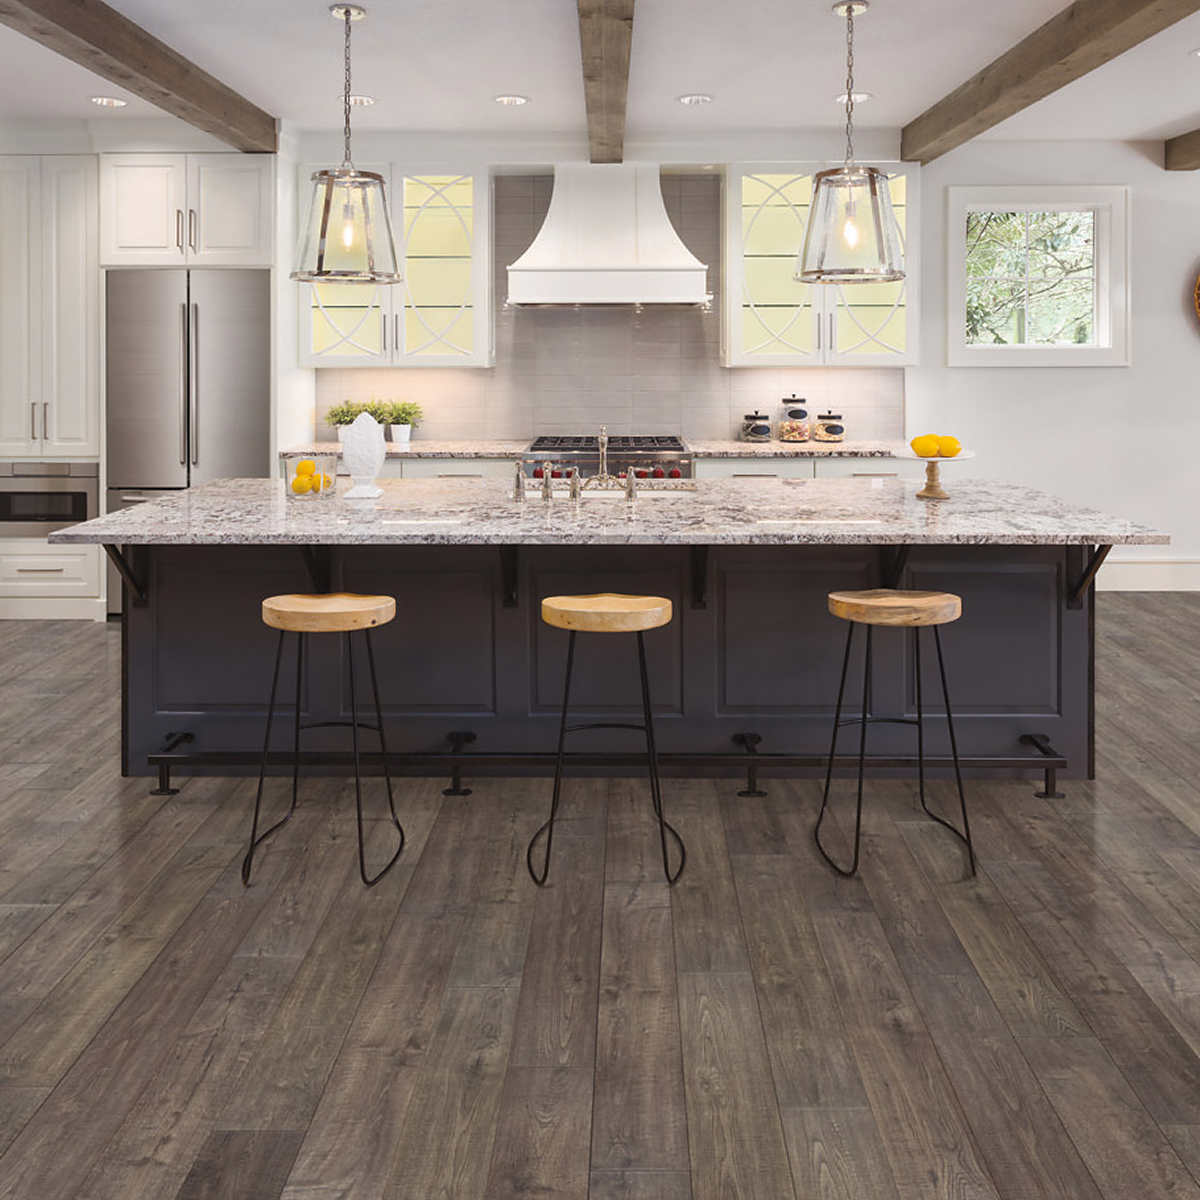 Mohawk Home Southbridge Scraped Oak 10mm Thick Laminate Flooring With Splashdefense Technology 2mm Pad Attached